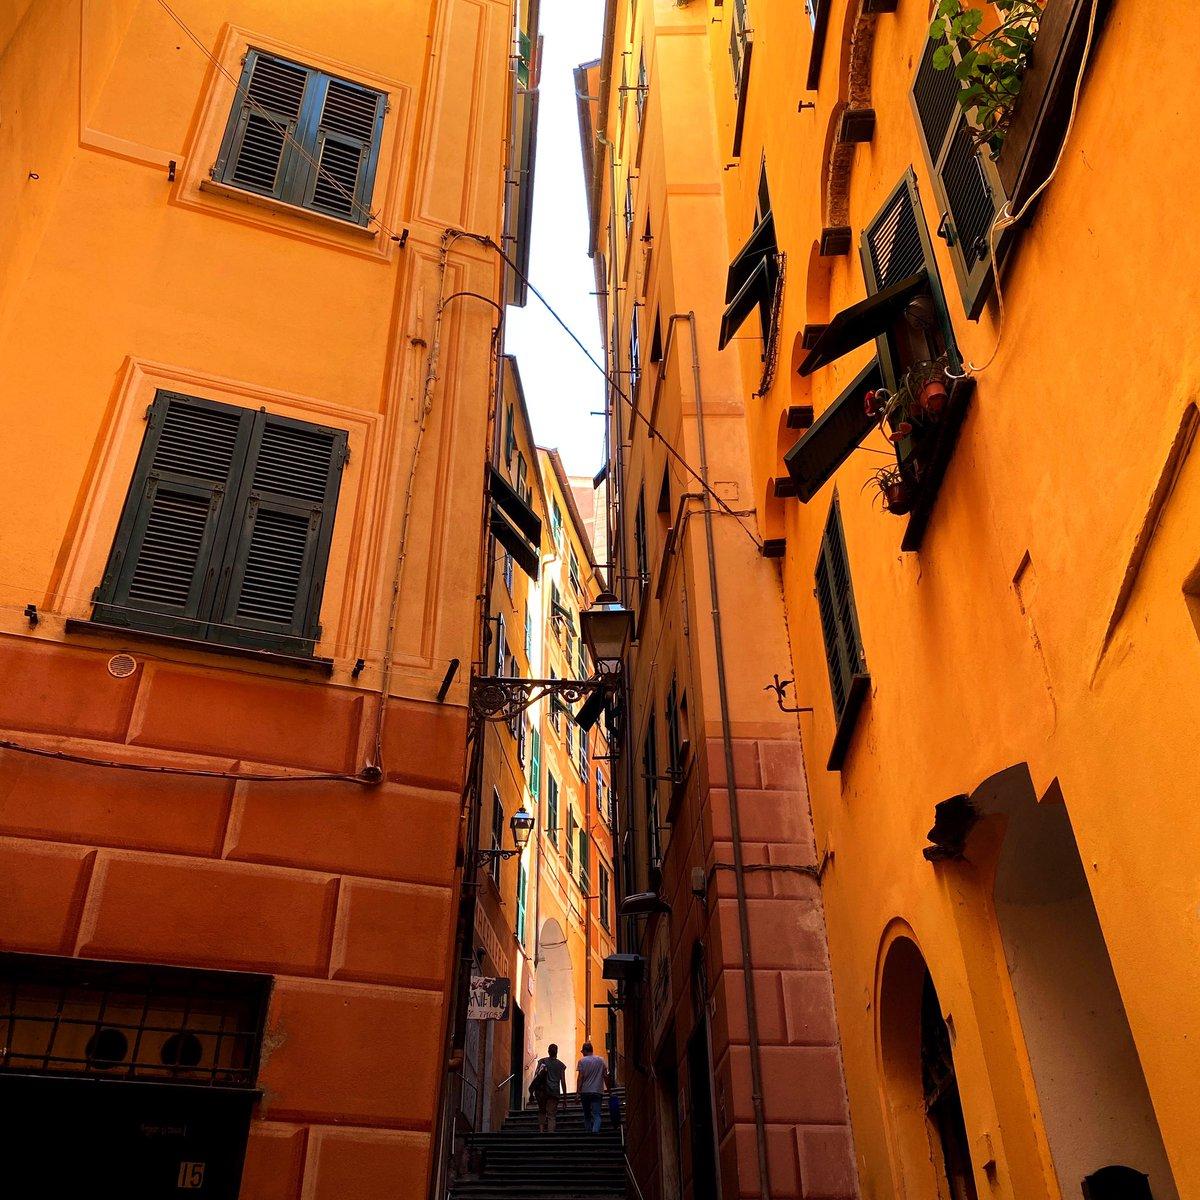 11:33 #Camogli #Genova #Gênes #liguria #iphoneography #iPhone11Pro #iphoneonly